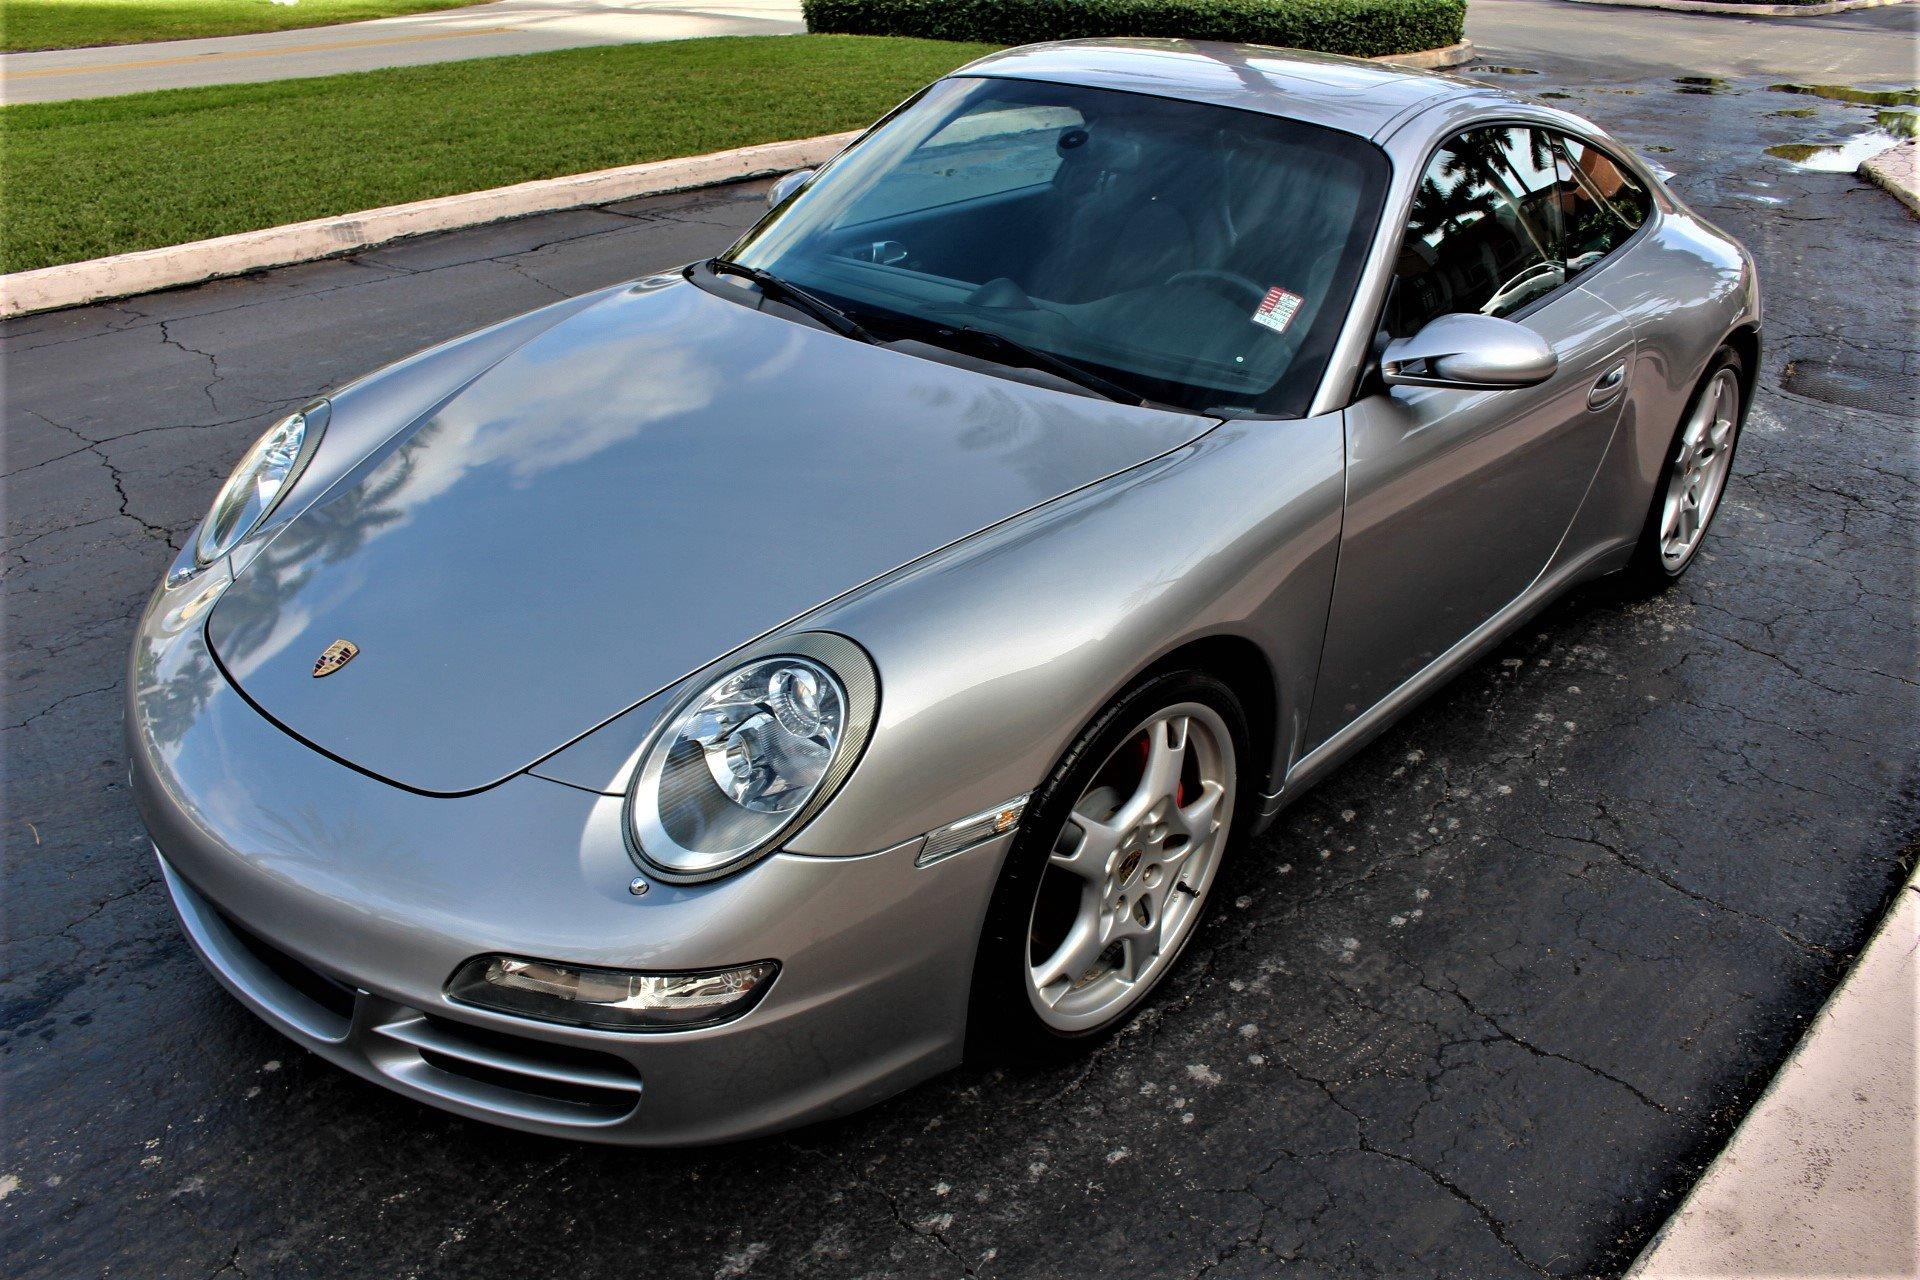 Used 2007 Porsche 911 Carrera S for sale $42,850 at The Gables Sports Cars in Miami FL 33146 4